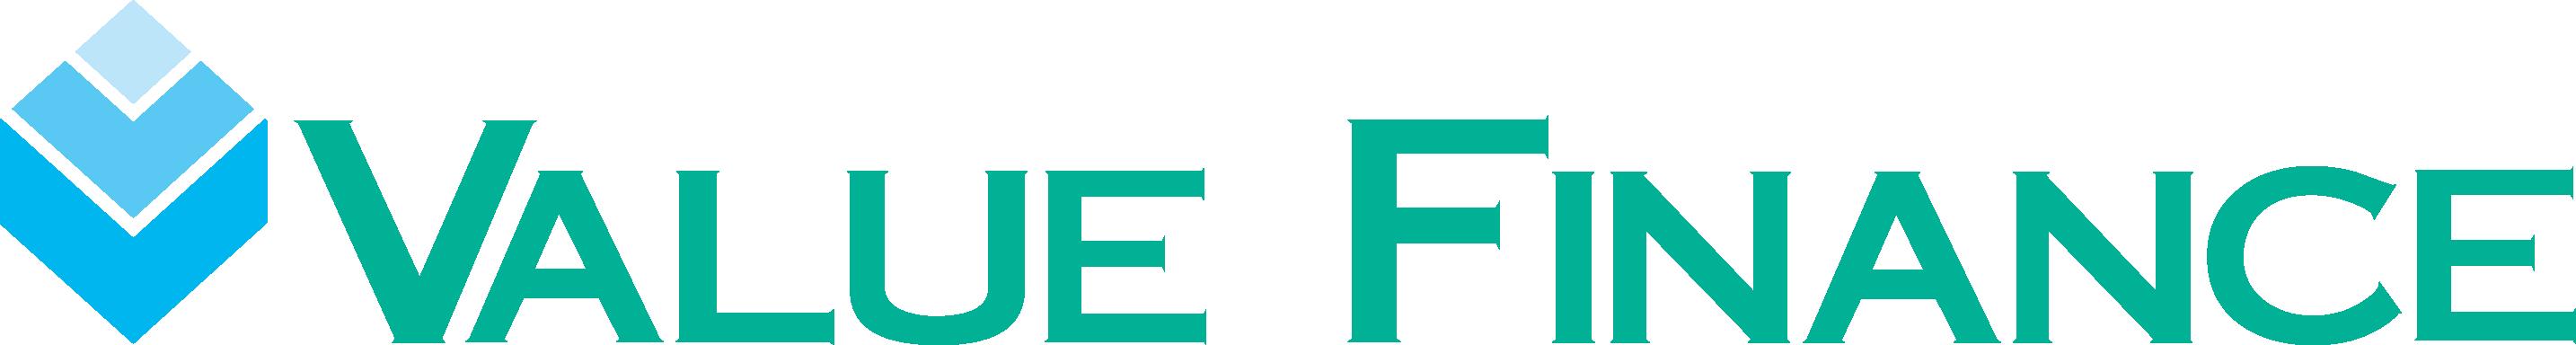 Value Finance logo